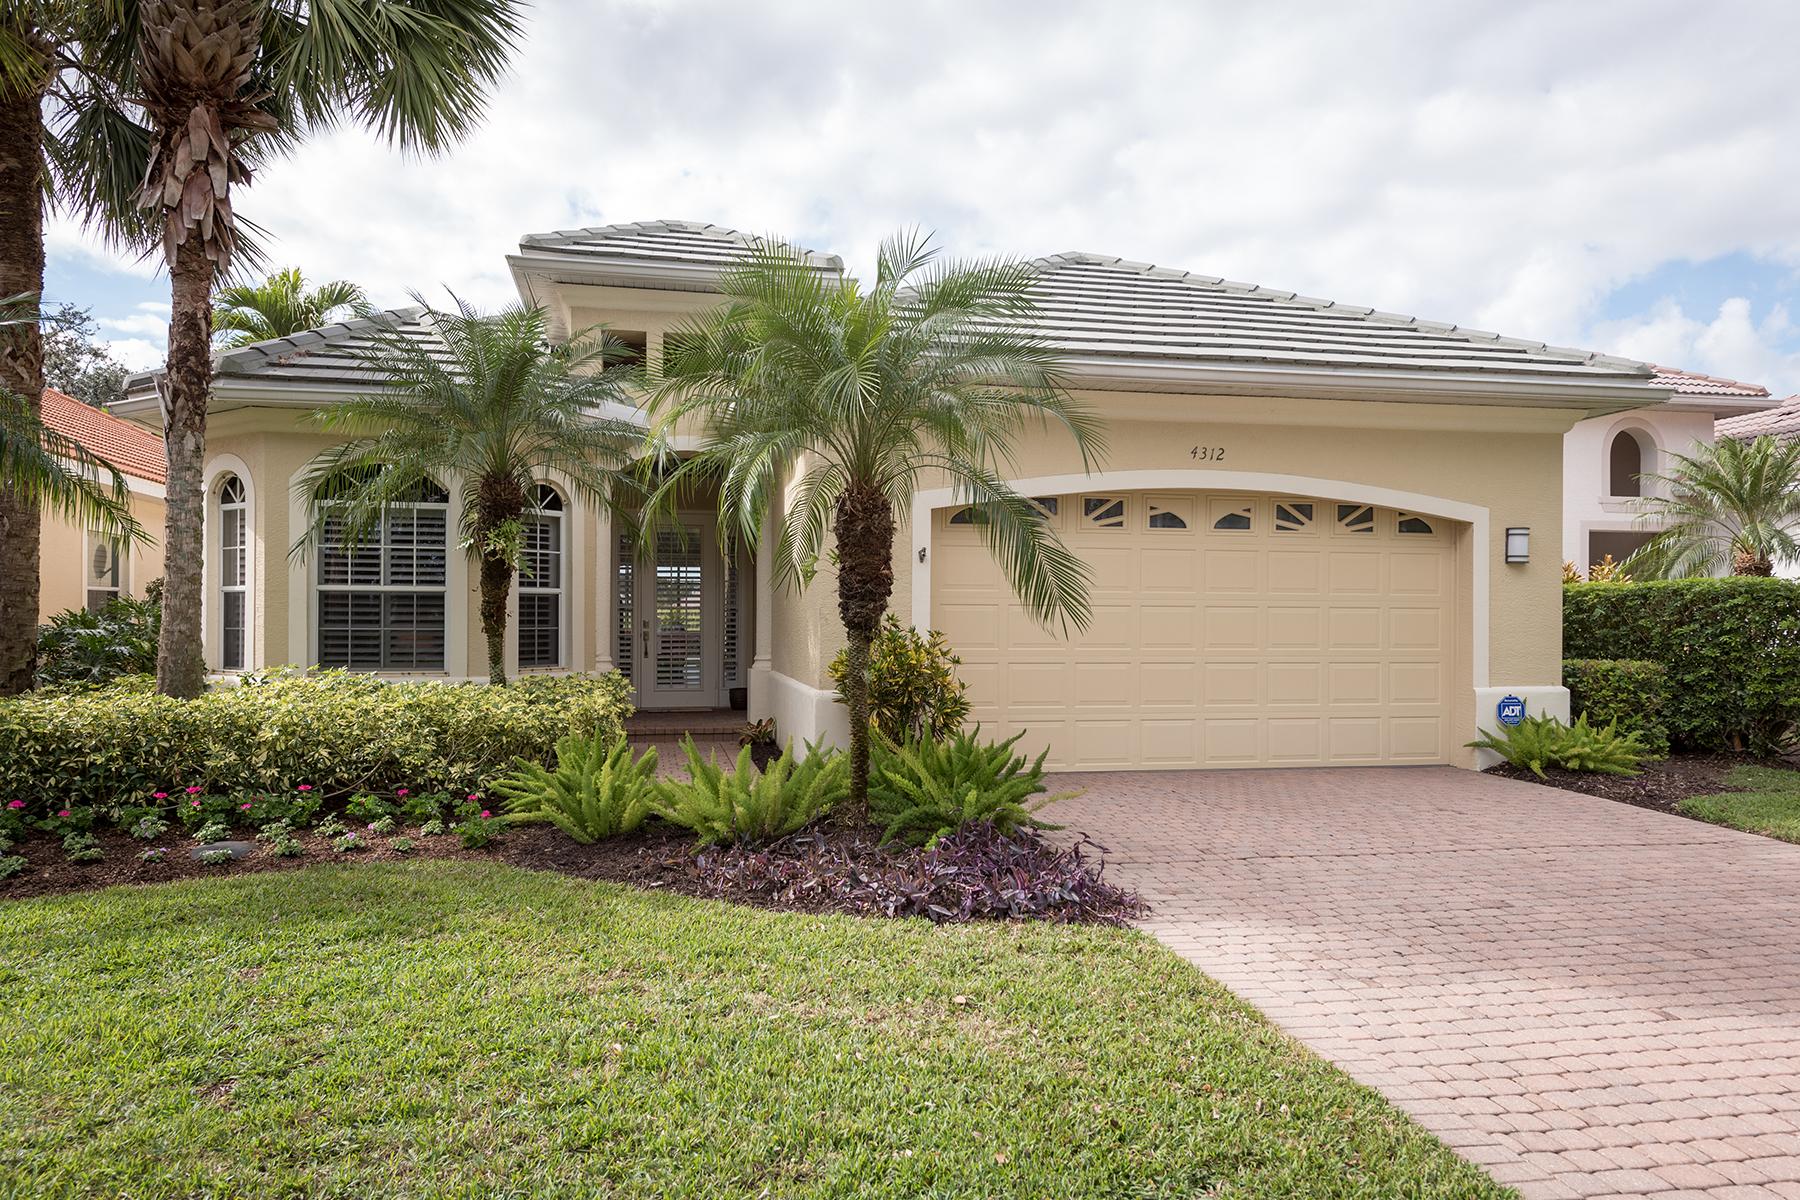 Single Family Home for Sale at KENSINGTON - SHEFFIELD VILLAS 4312 Kensington High St, Naples, Florida, 34105 United States